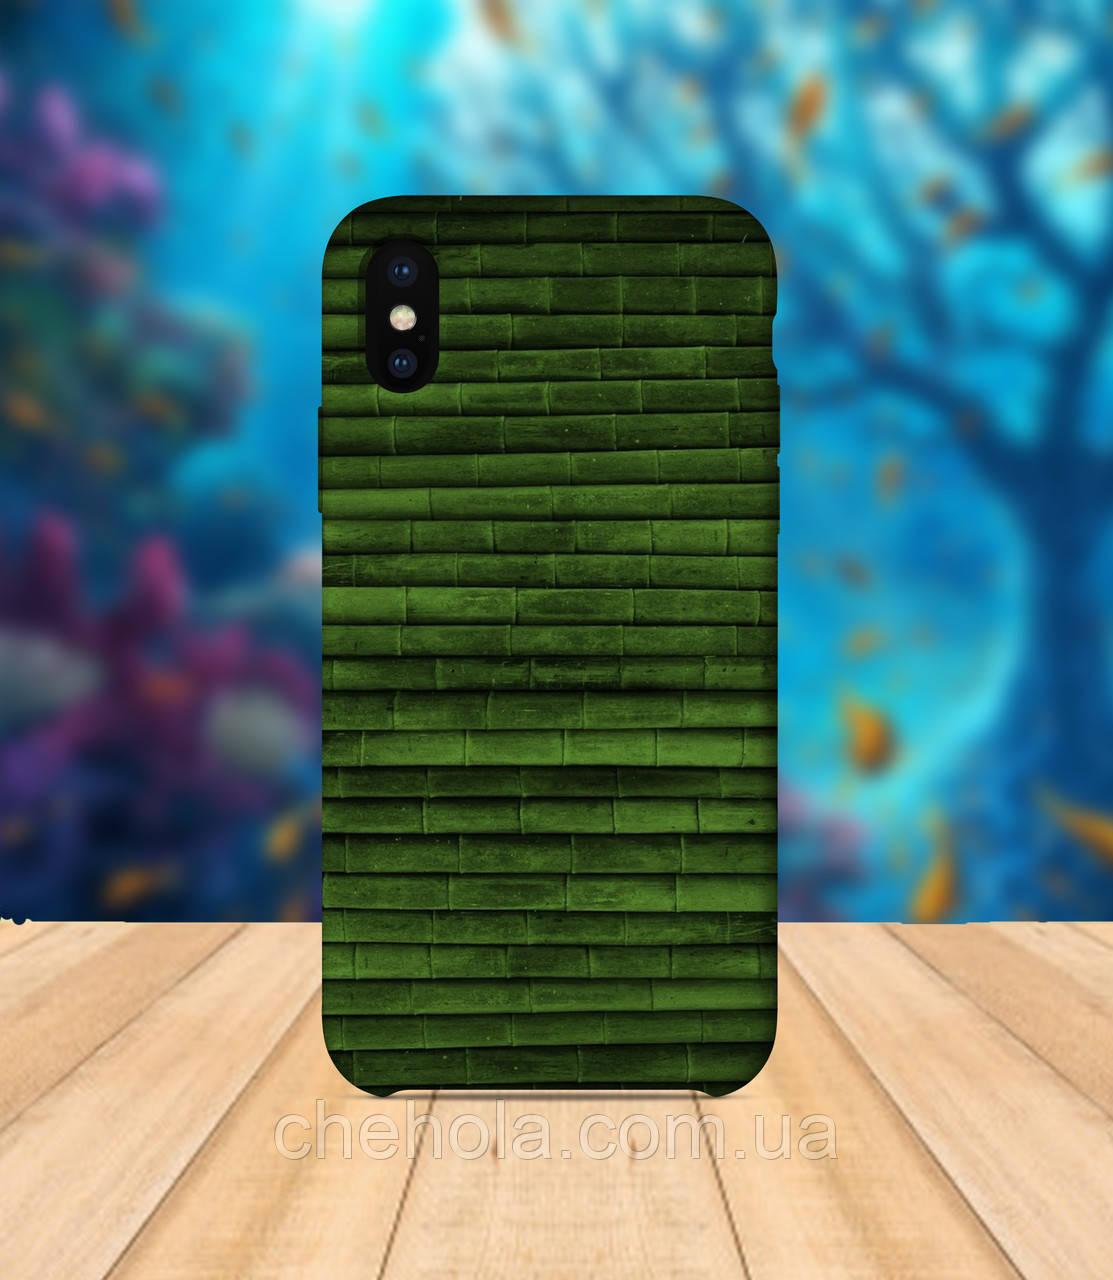 Чехол для apple iphone x XS max бамбук чехол с принтом